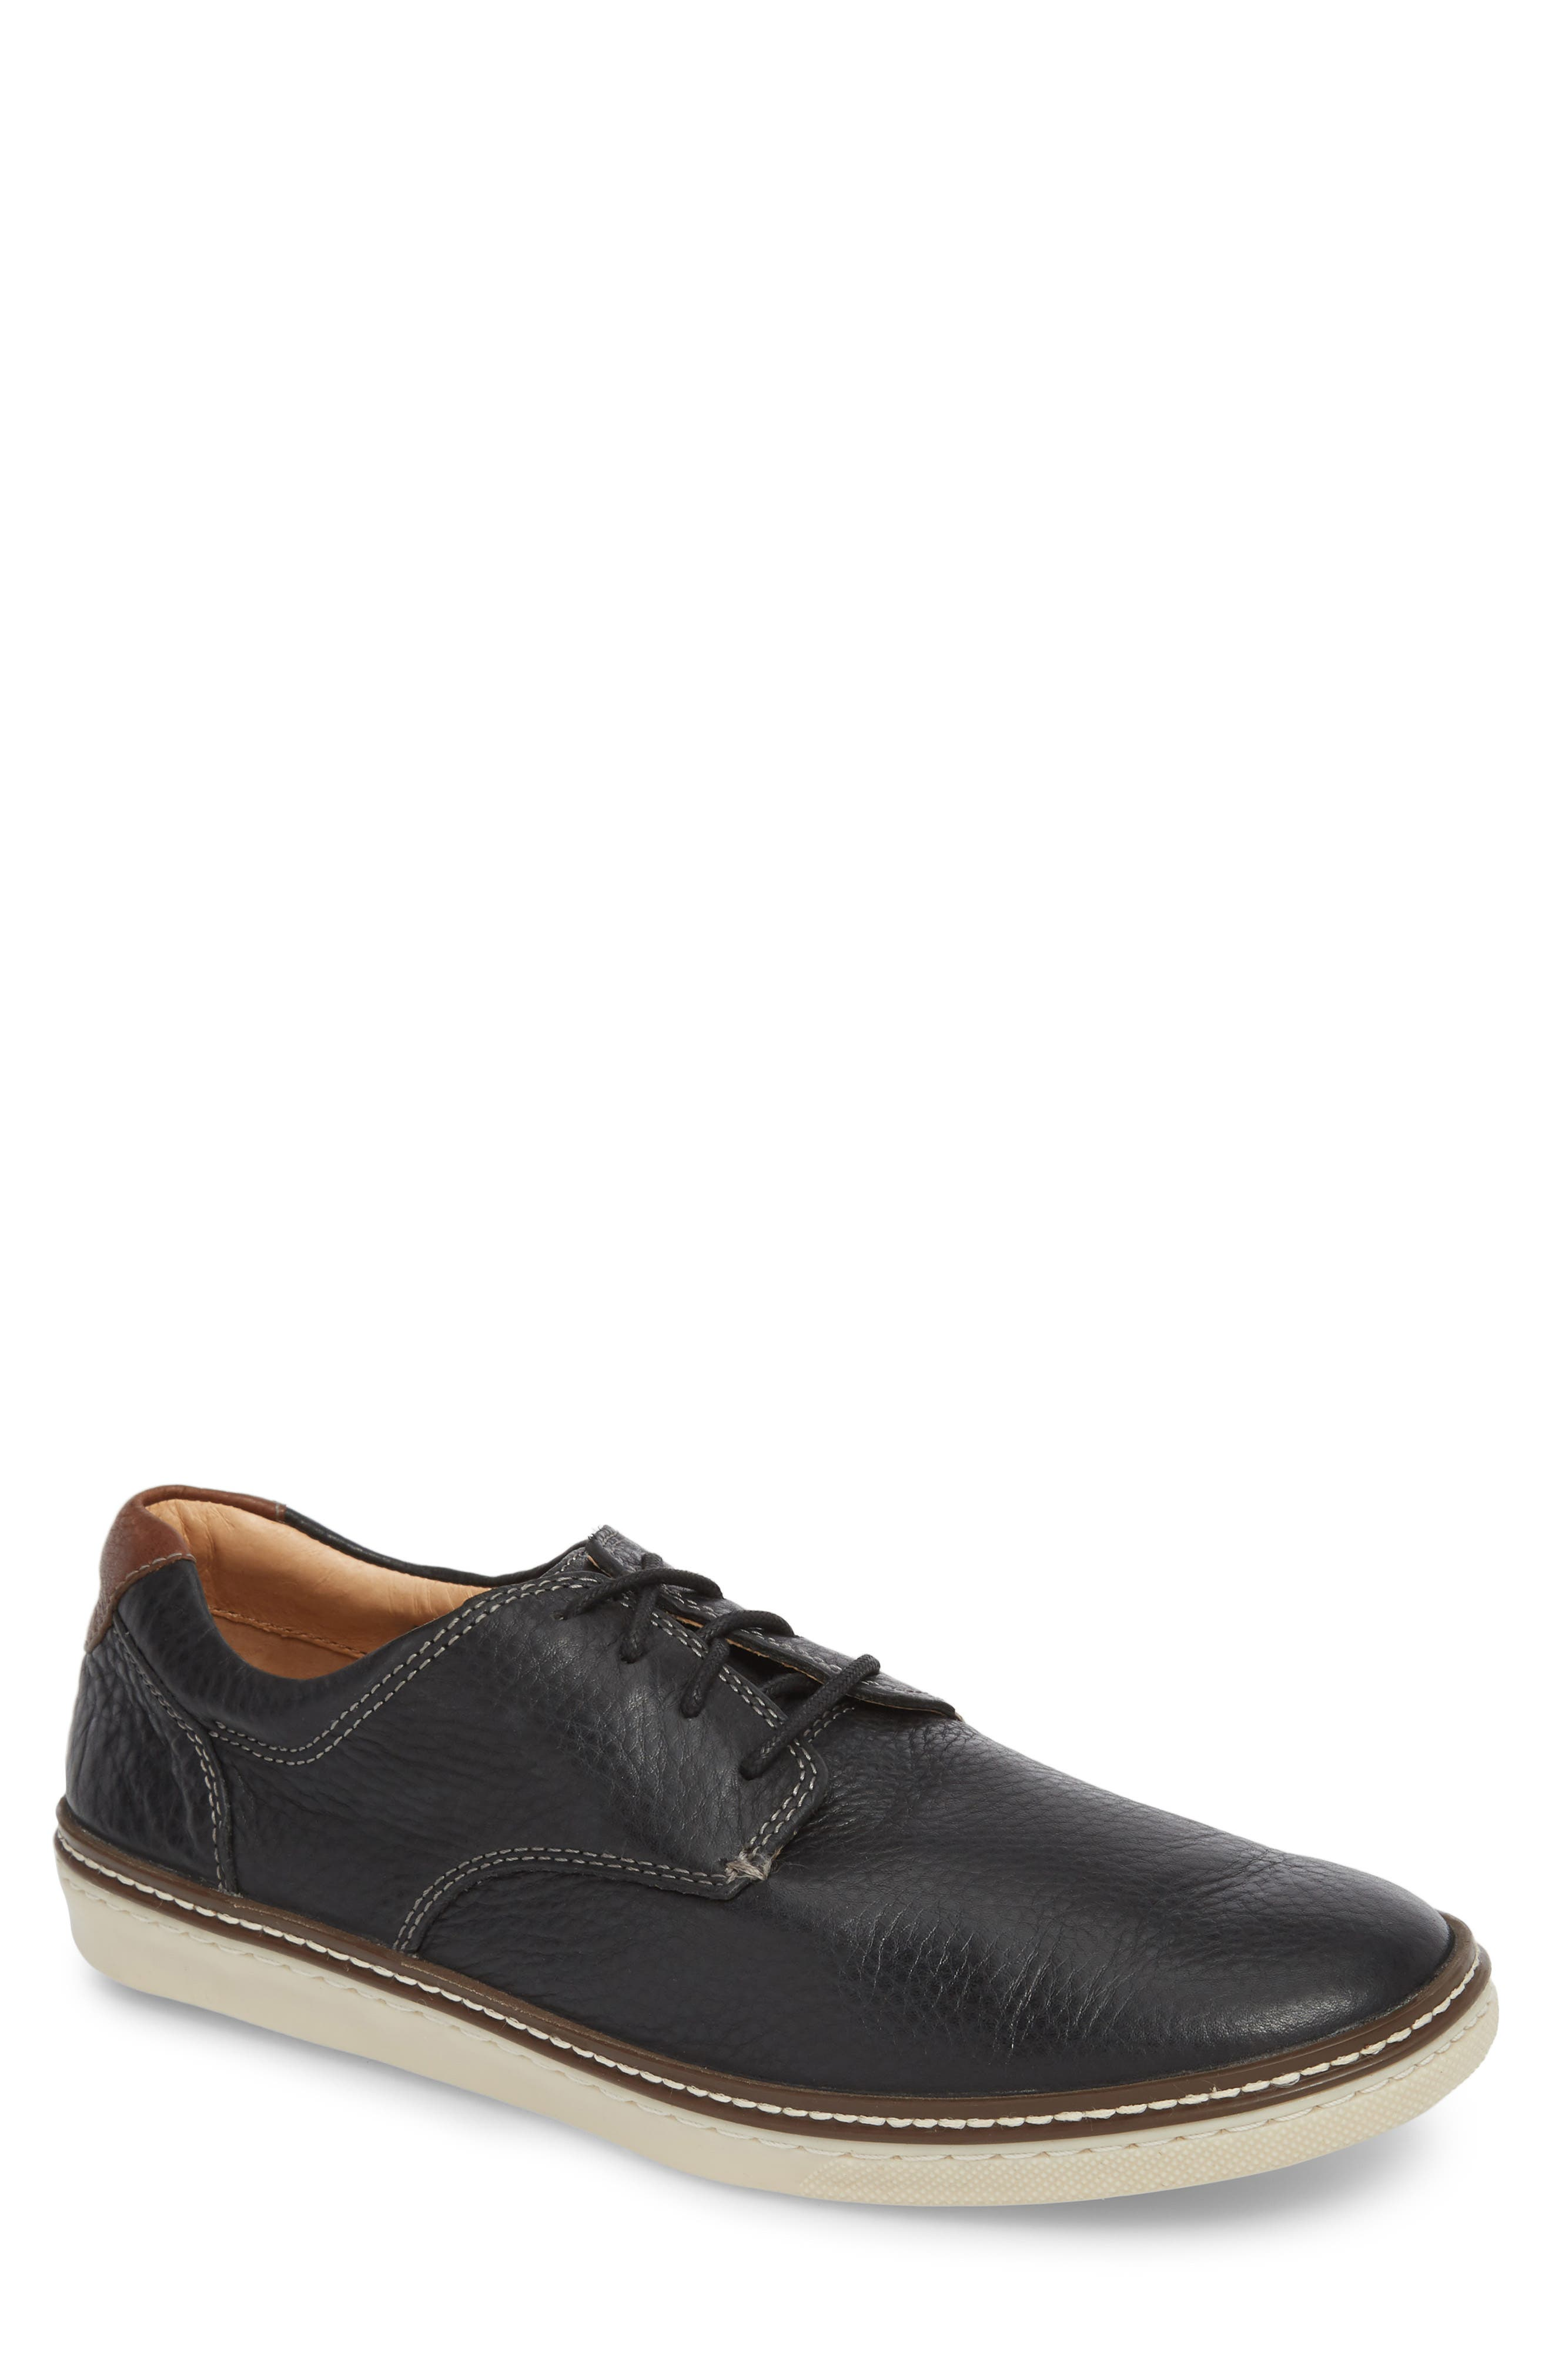 McGuffey Derby Sneaker,                         Main,                         color, BLACK LEATHER